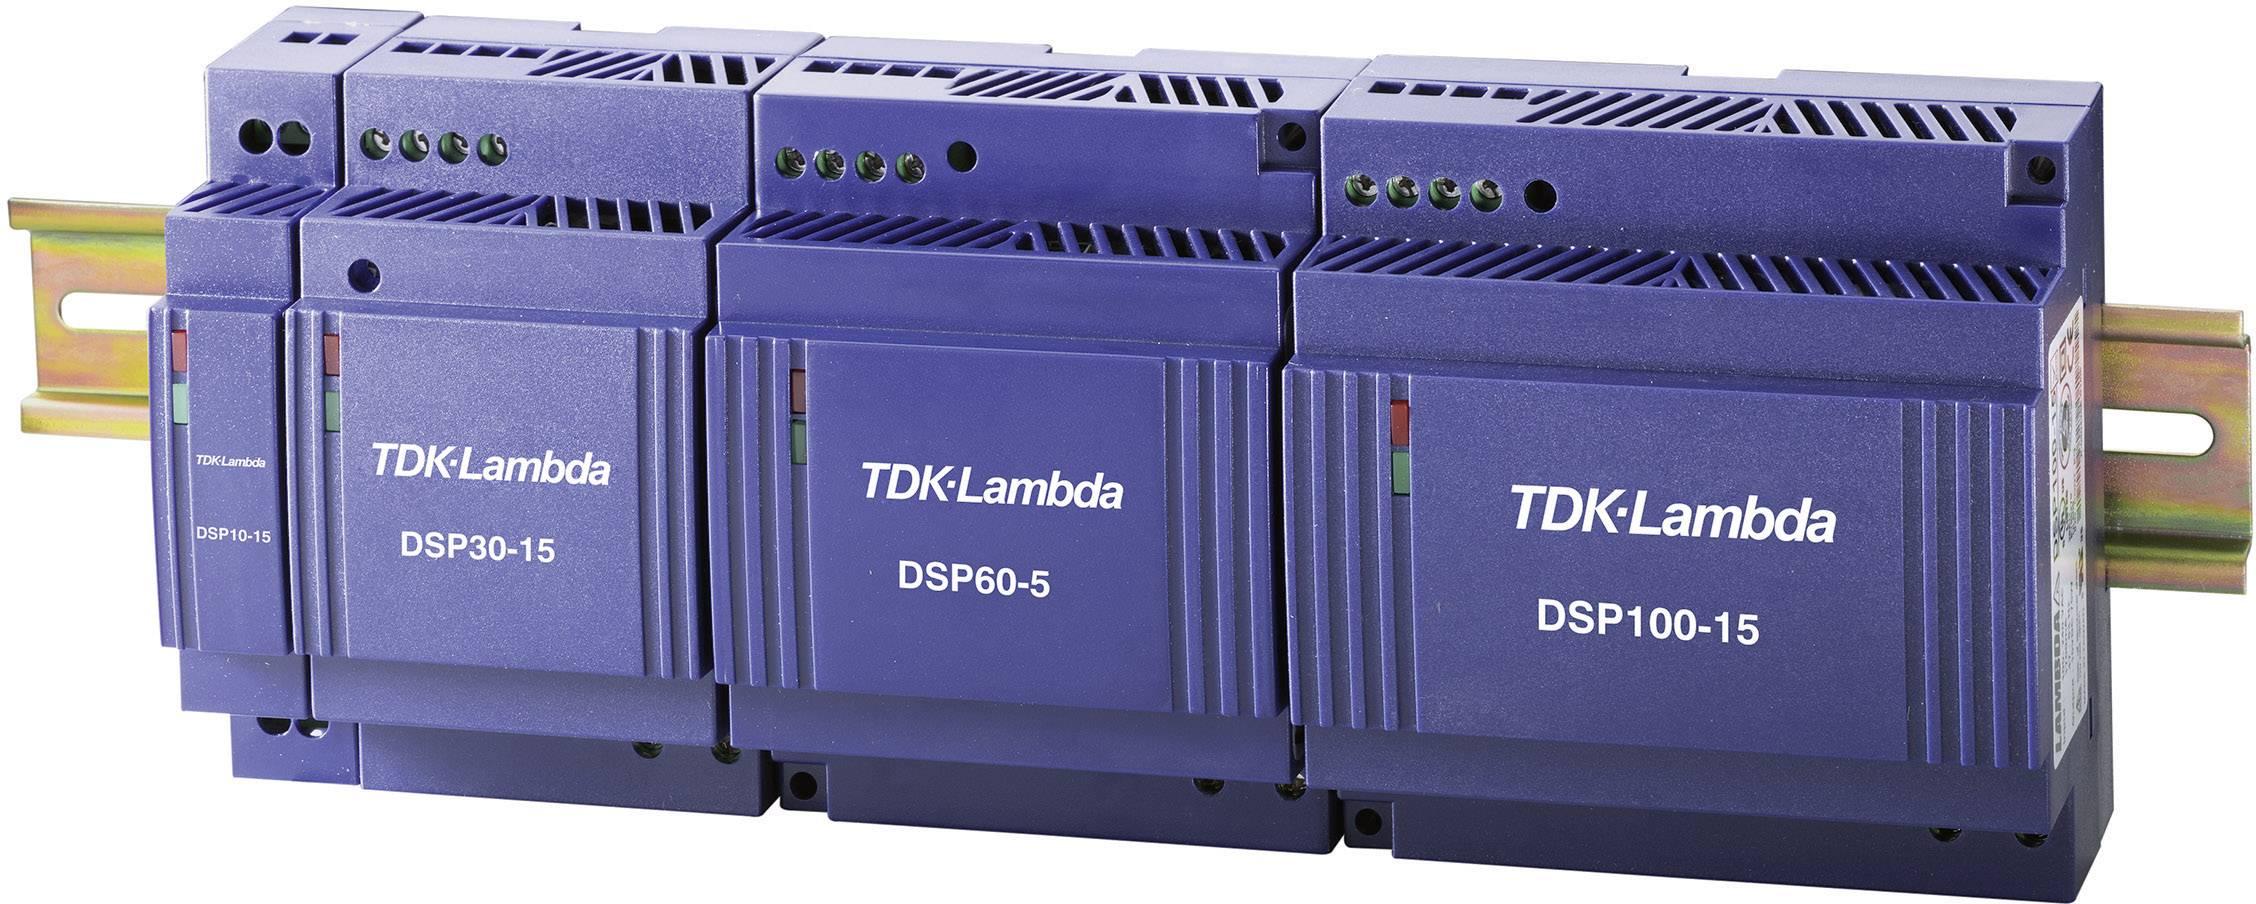 Sieťový zdroj na montážnu lištu (DIN lištu) TDK-Lambda DSP-60-15, 1 x, 15 V/DC, 4 A, 60 W